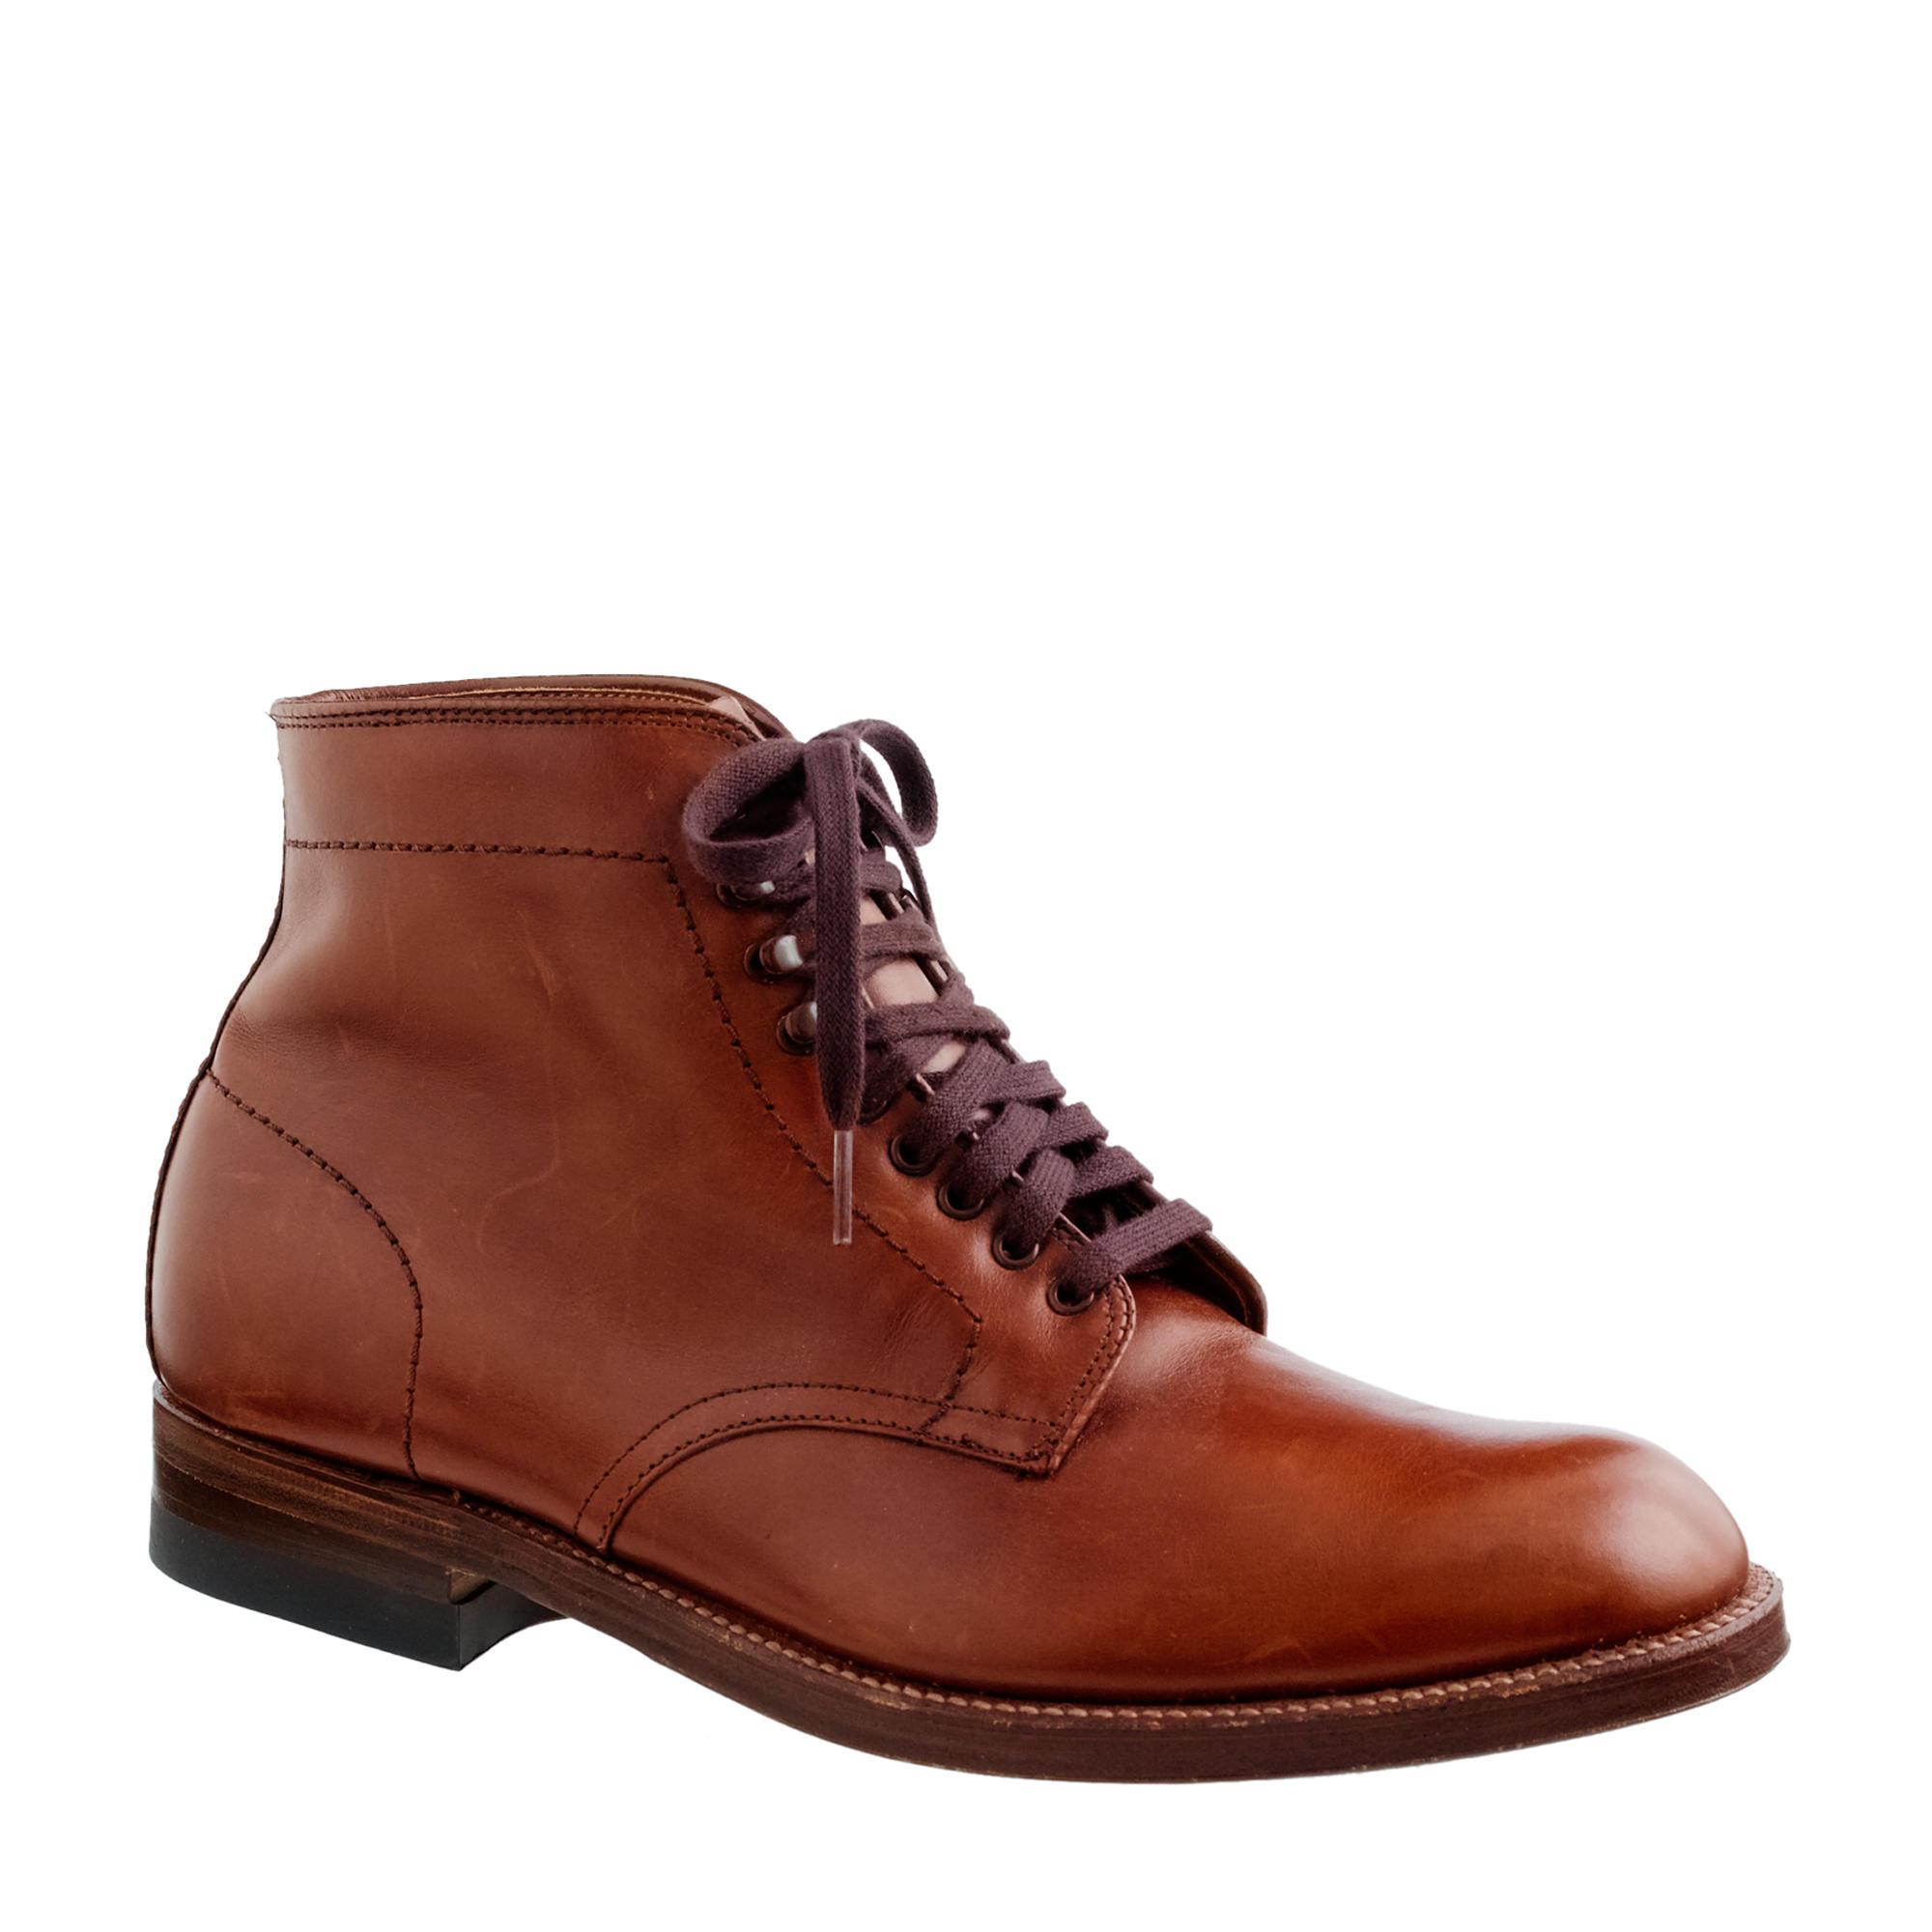 Lyst Alden Alden 174 For J Crew Plain Toe Boots In Brown